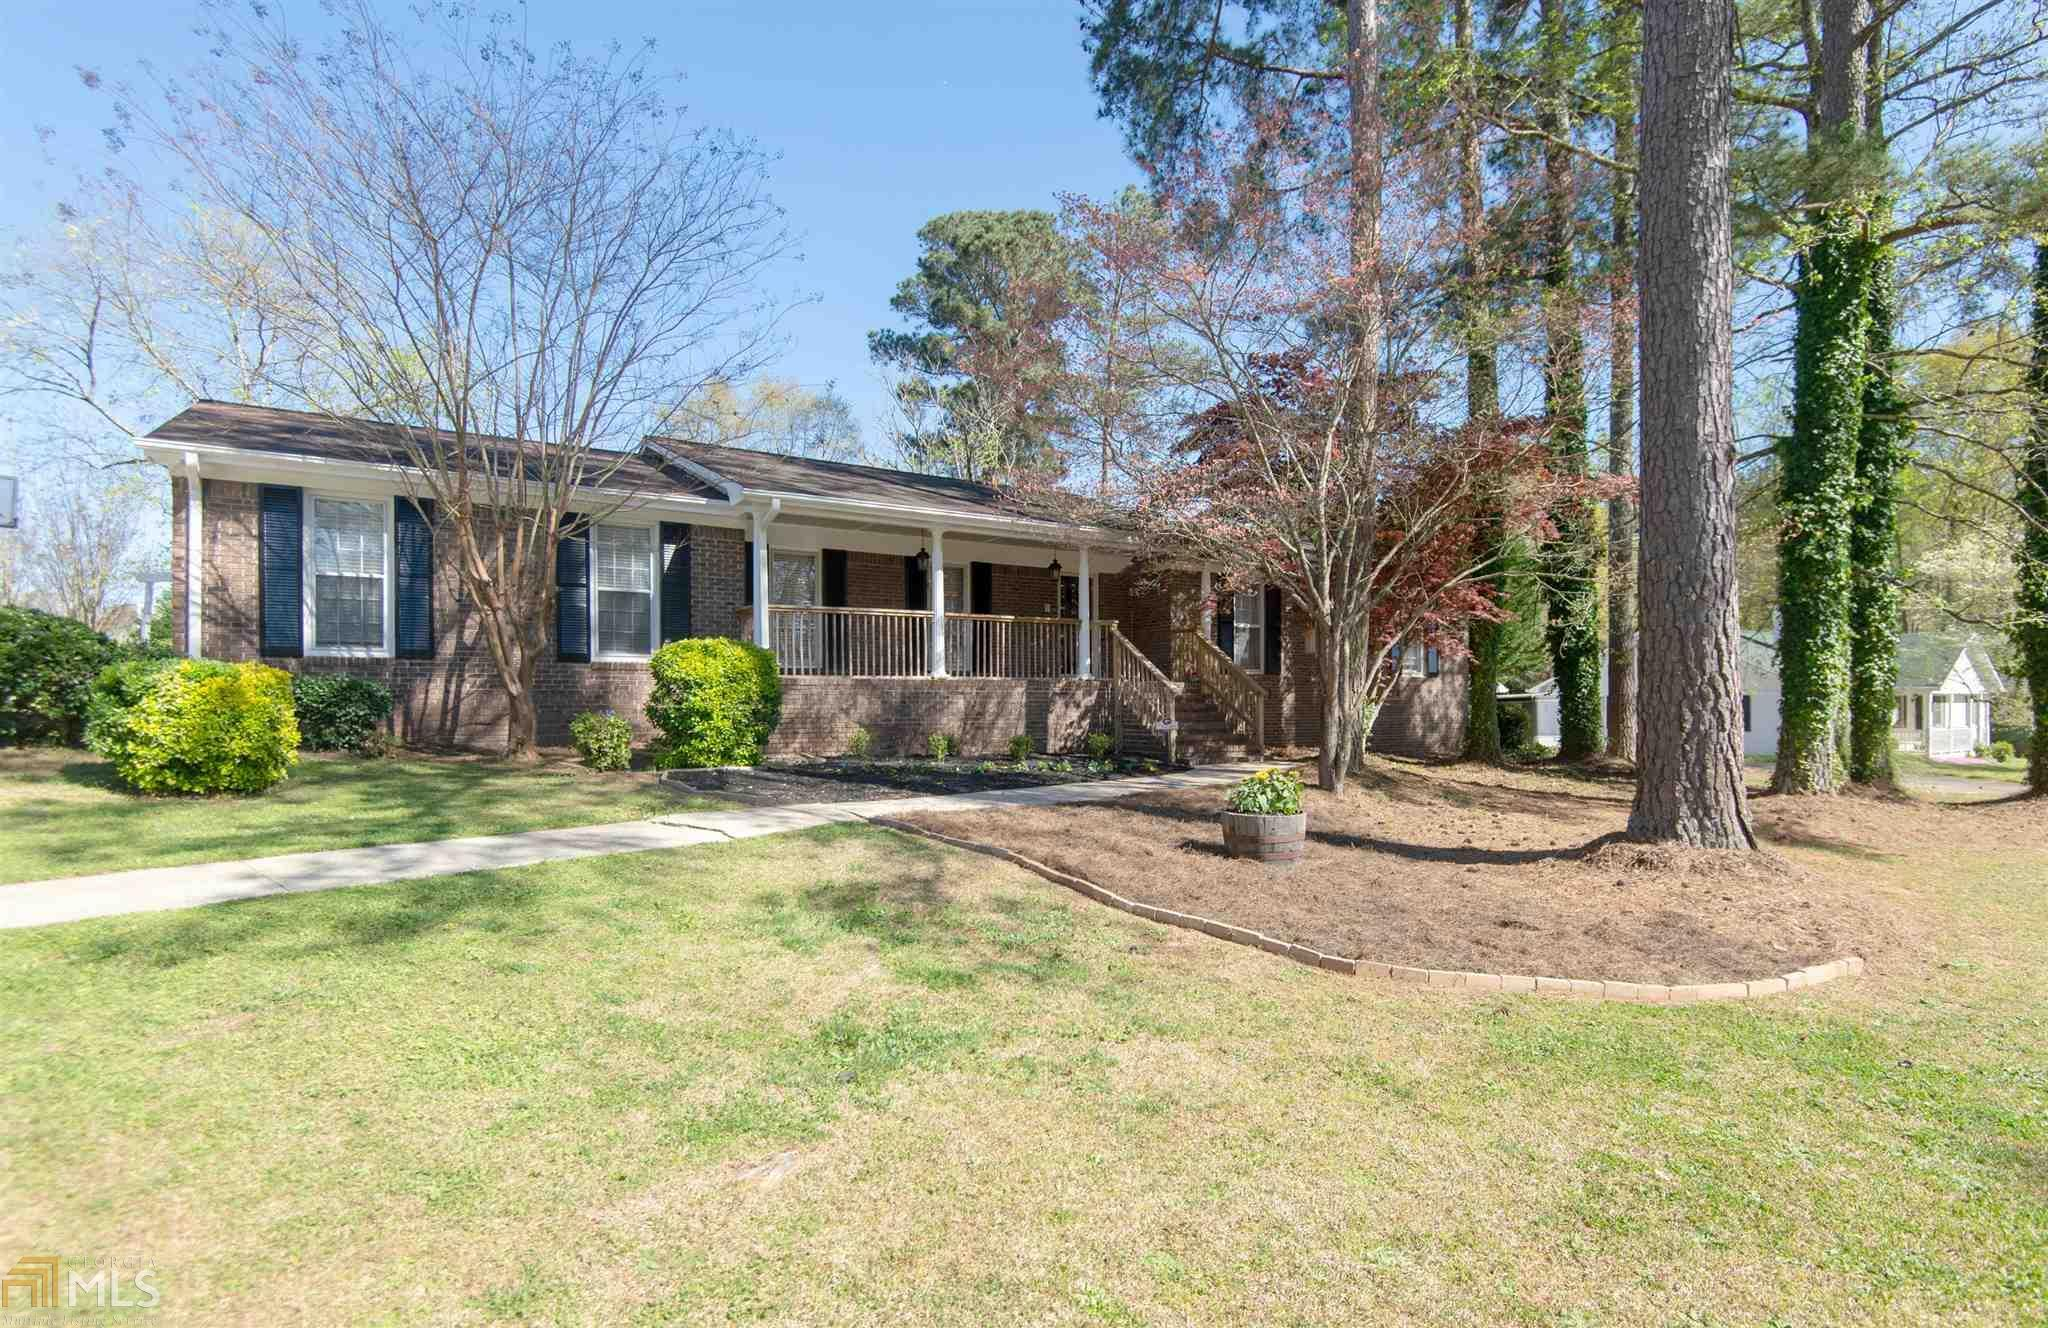 218 Heritage Cir, McDonough, GA | MLS# 8556219 | Ramsey